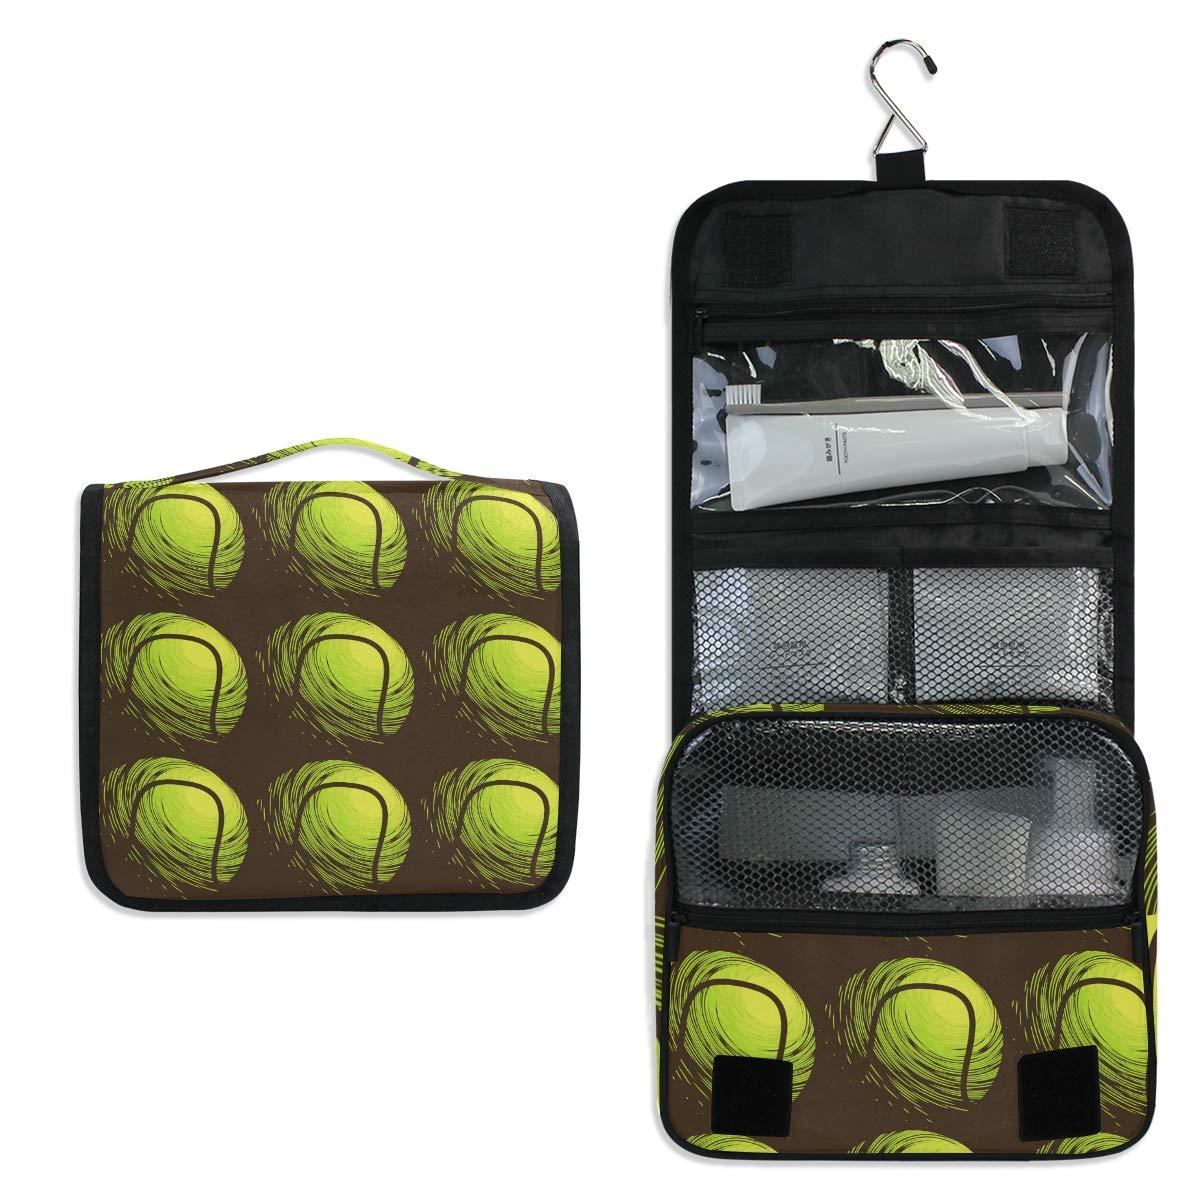 Toiletry Bag Travel Bag Hanging Hook - Sport Tennis Ball Waterproof Cosmetic Bag Portable Makeup Pouch for Girls Men Women